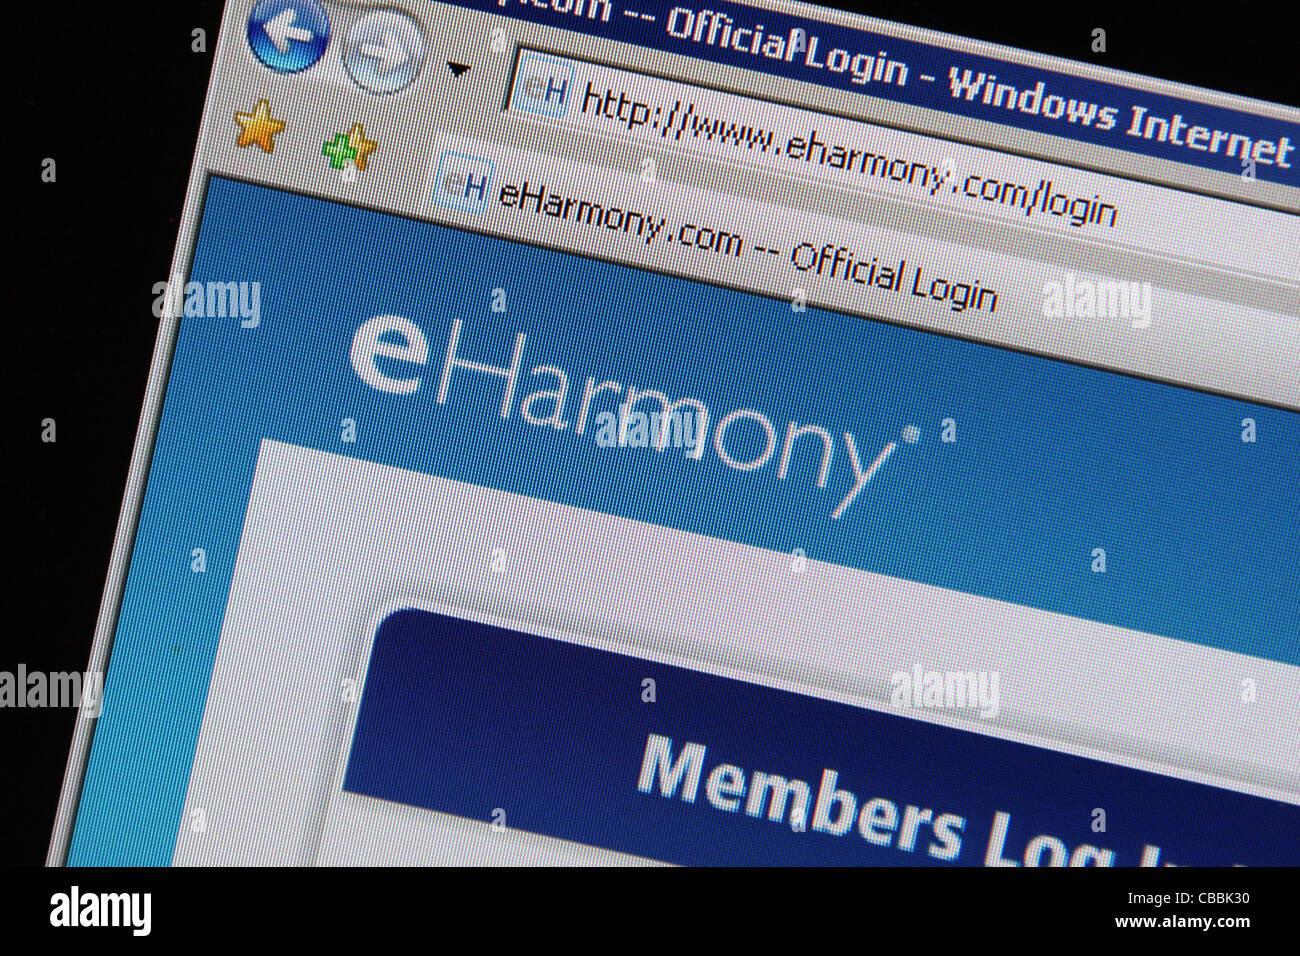 Eharmony official login